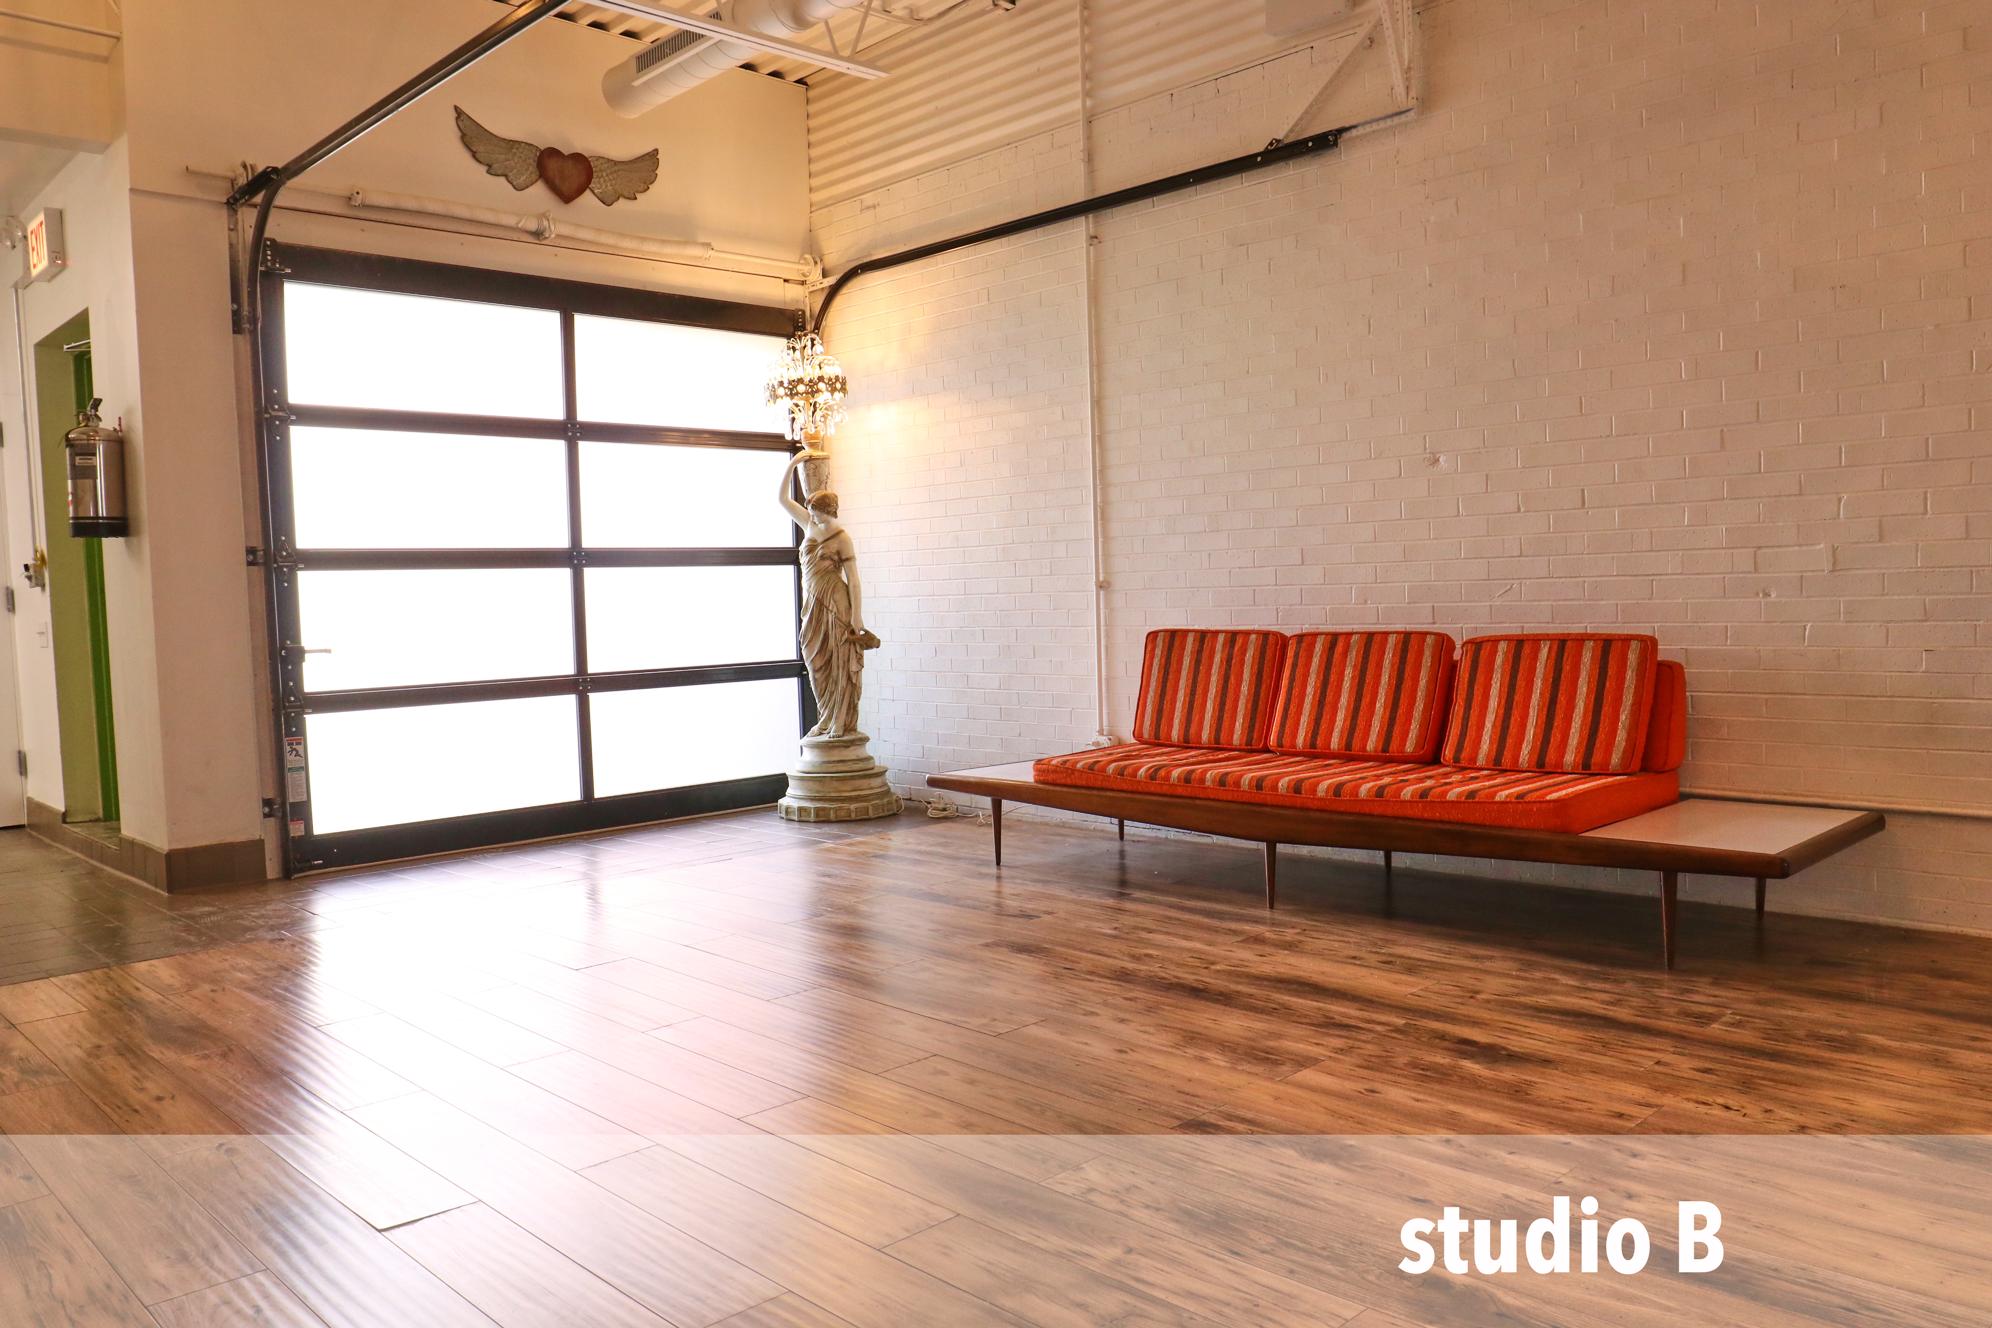 studio-B-7.png